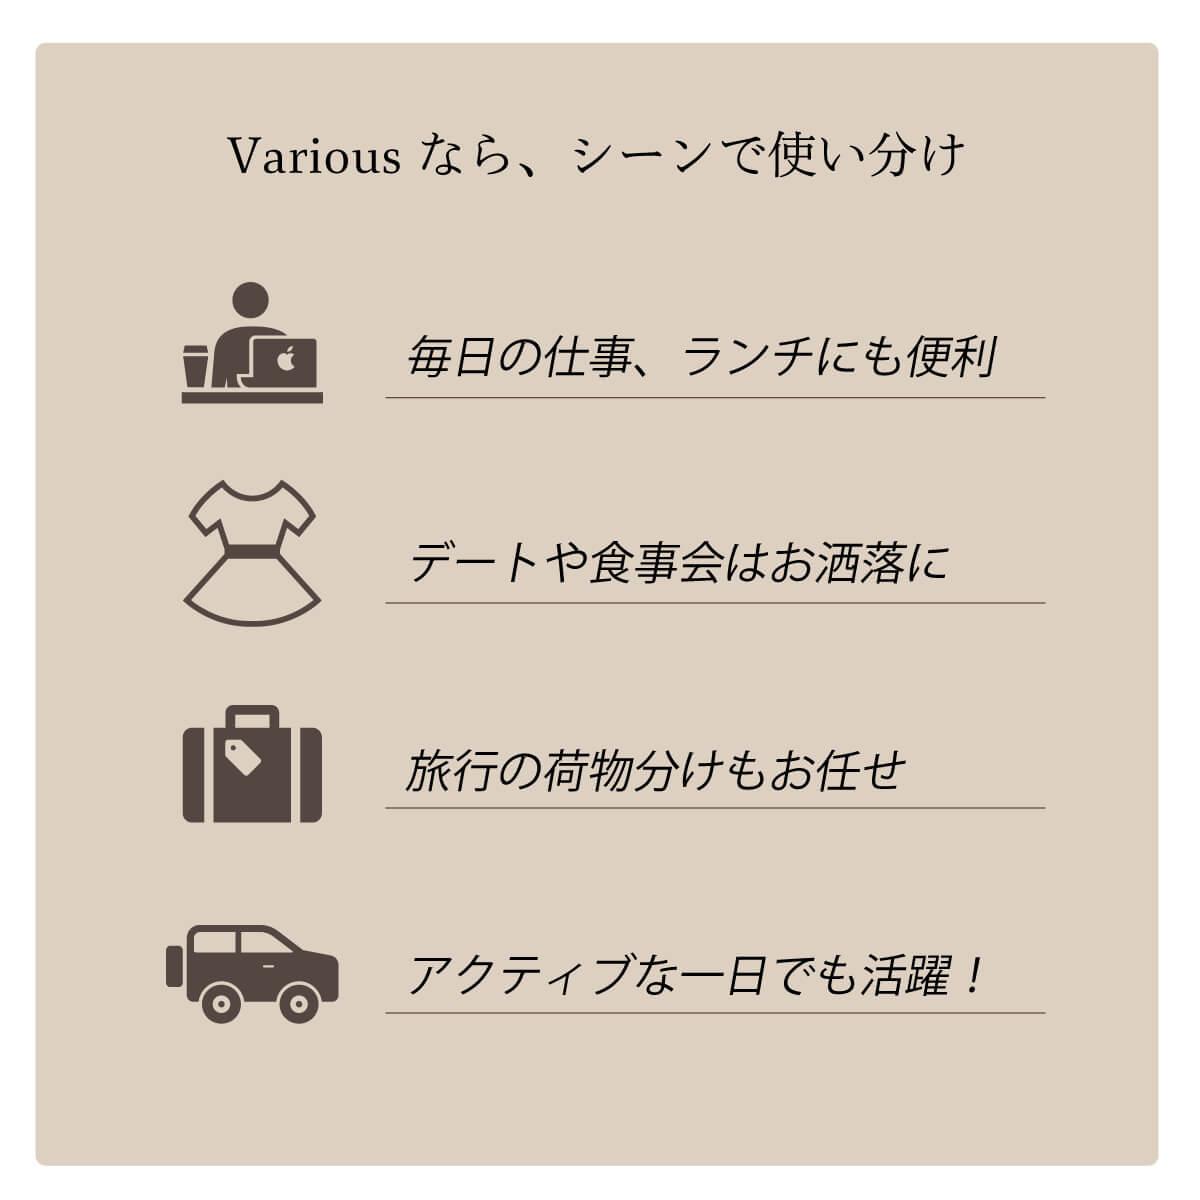 「Various」Camel ギャルソンウォレット お財布ポシェット ショルダー クラッチバッグ レザー 牛革